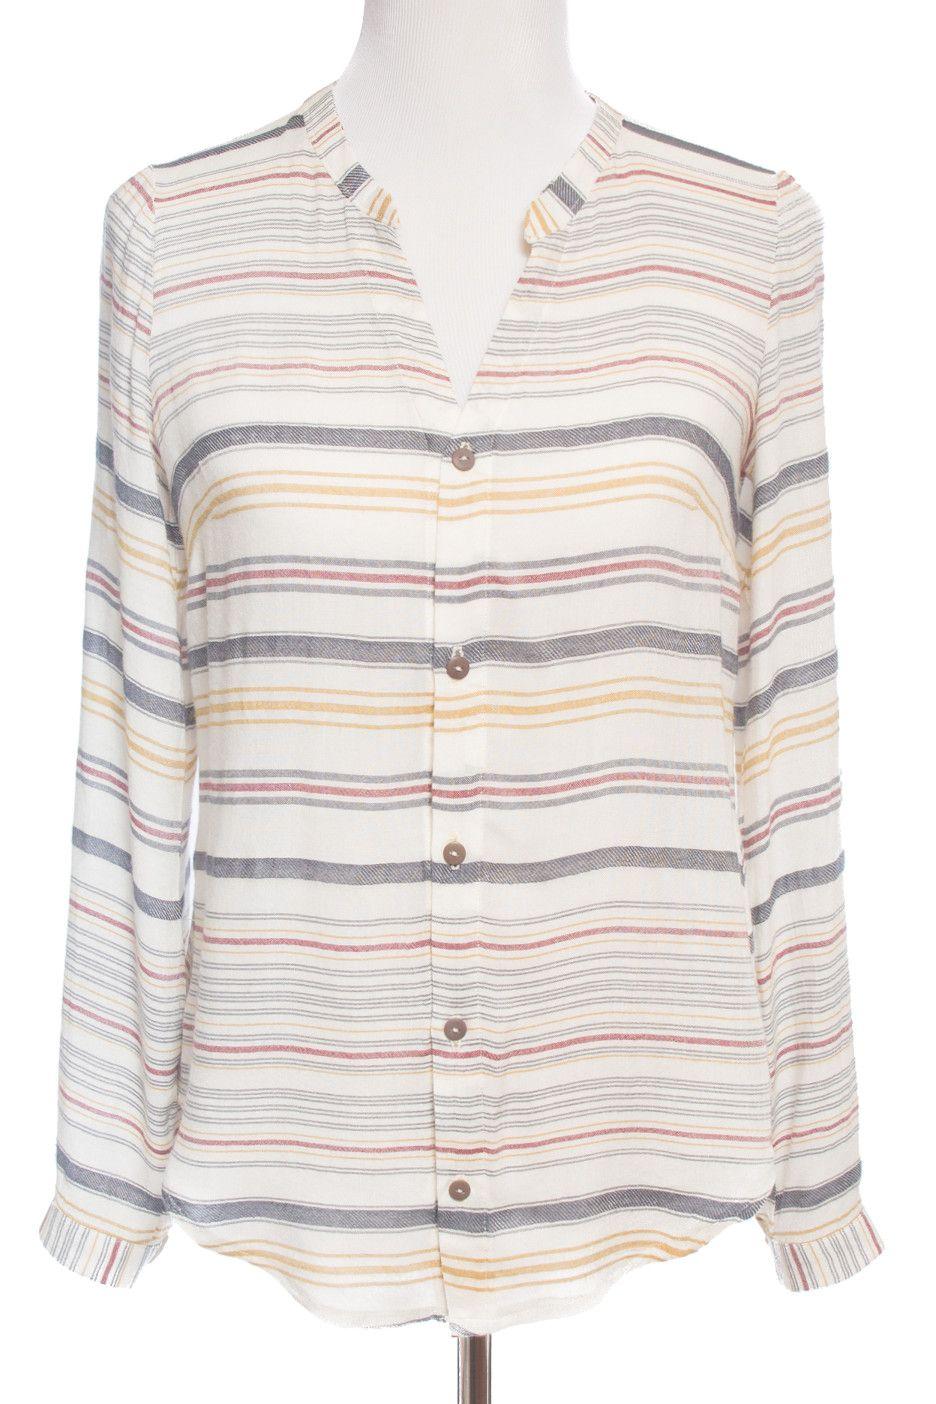 Bonn Shirt Sewing Pattern by Itch to Stitch | Bluse nähen, Kleidung ...